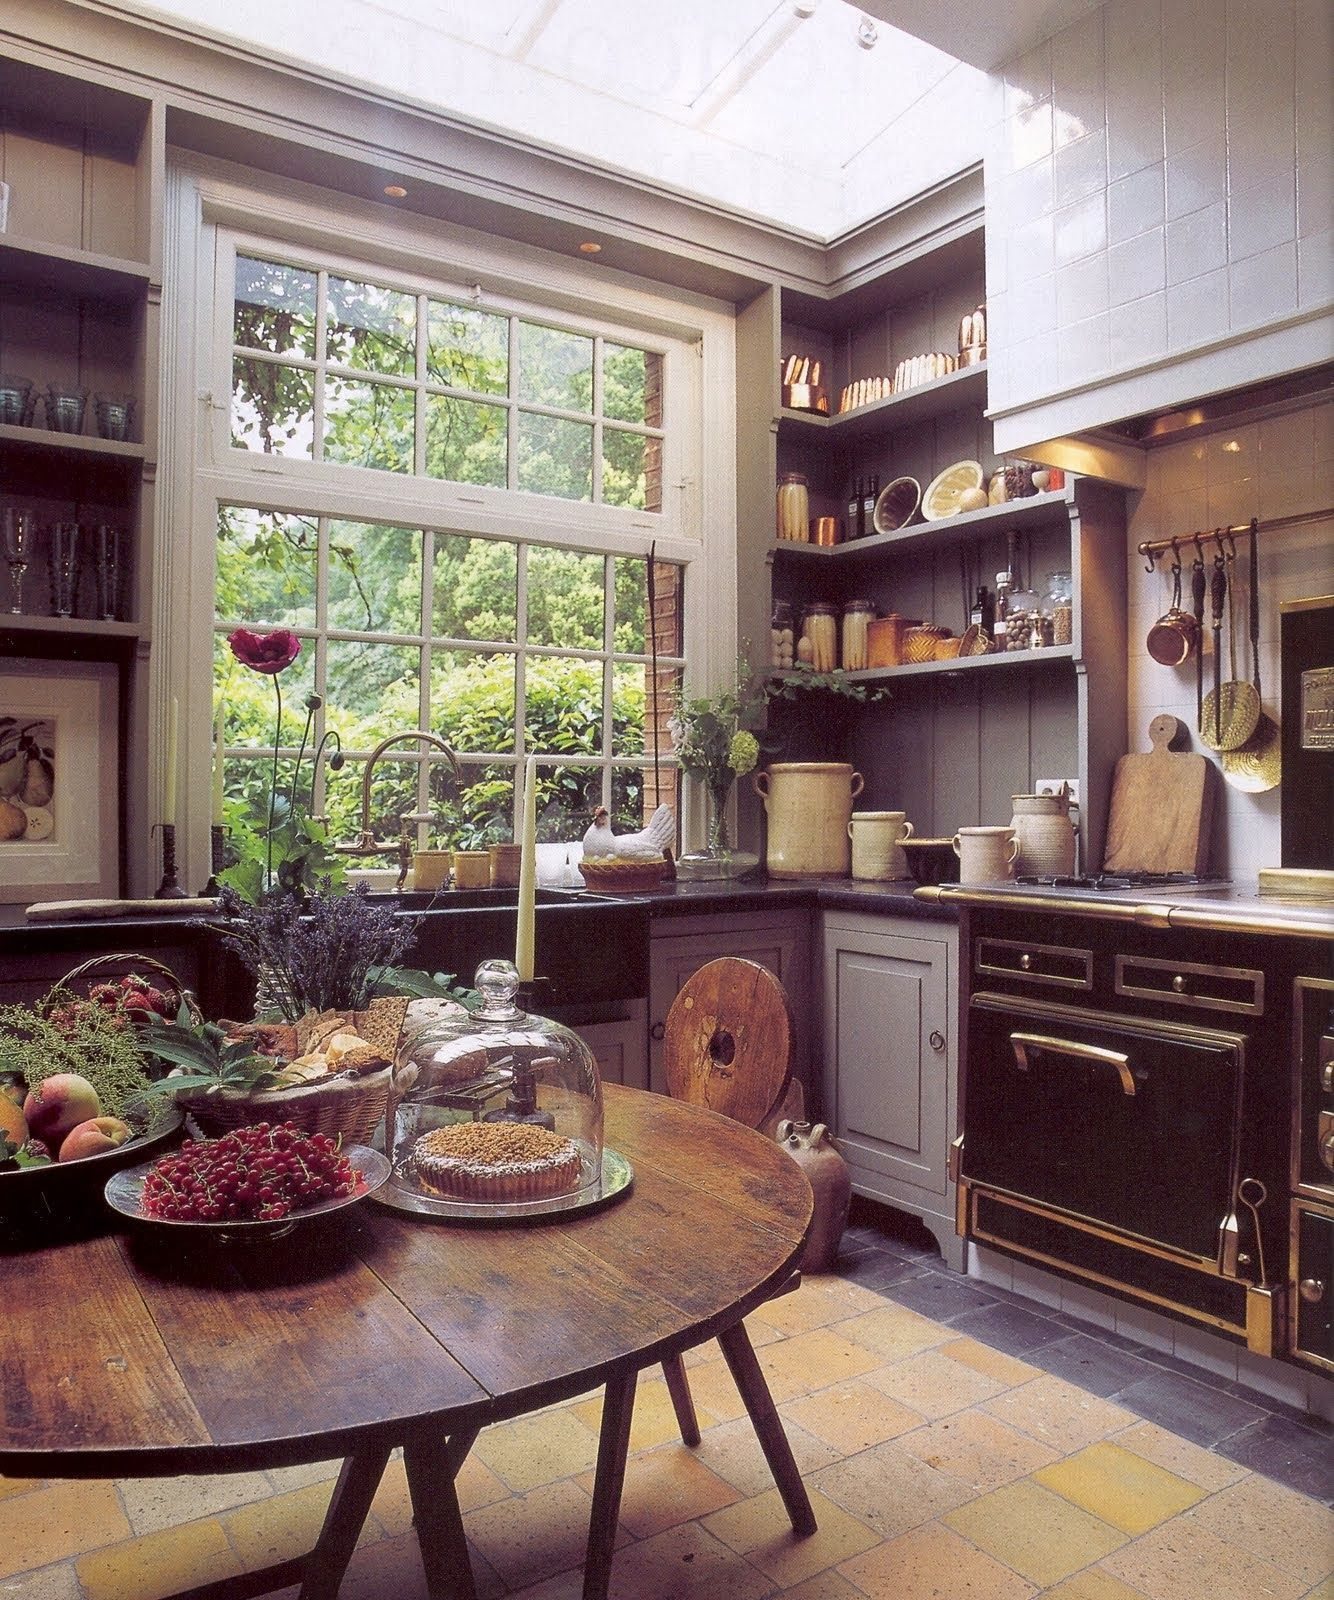 Etonnant The Centric Home: Boho Kitchen Decor #rustichomedecor